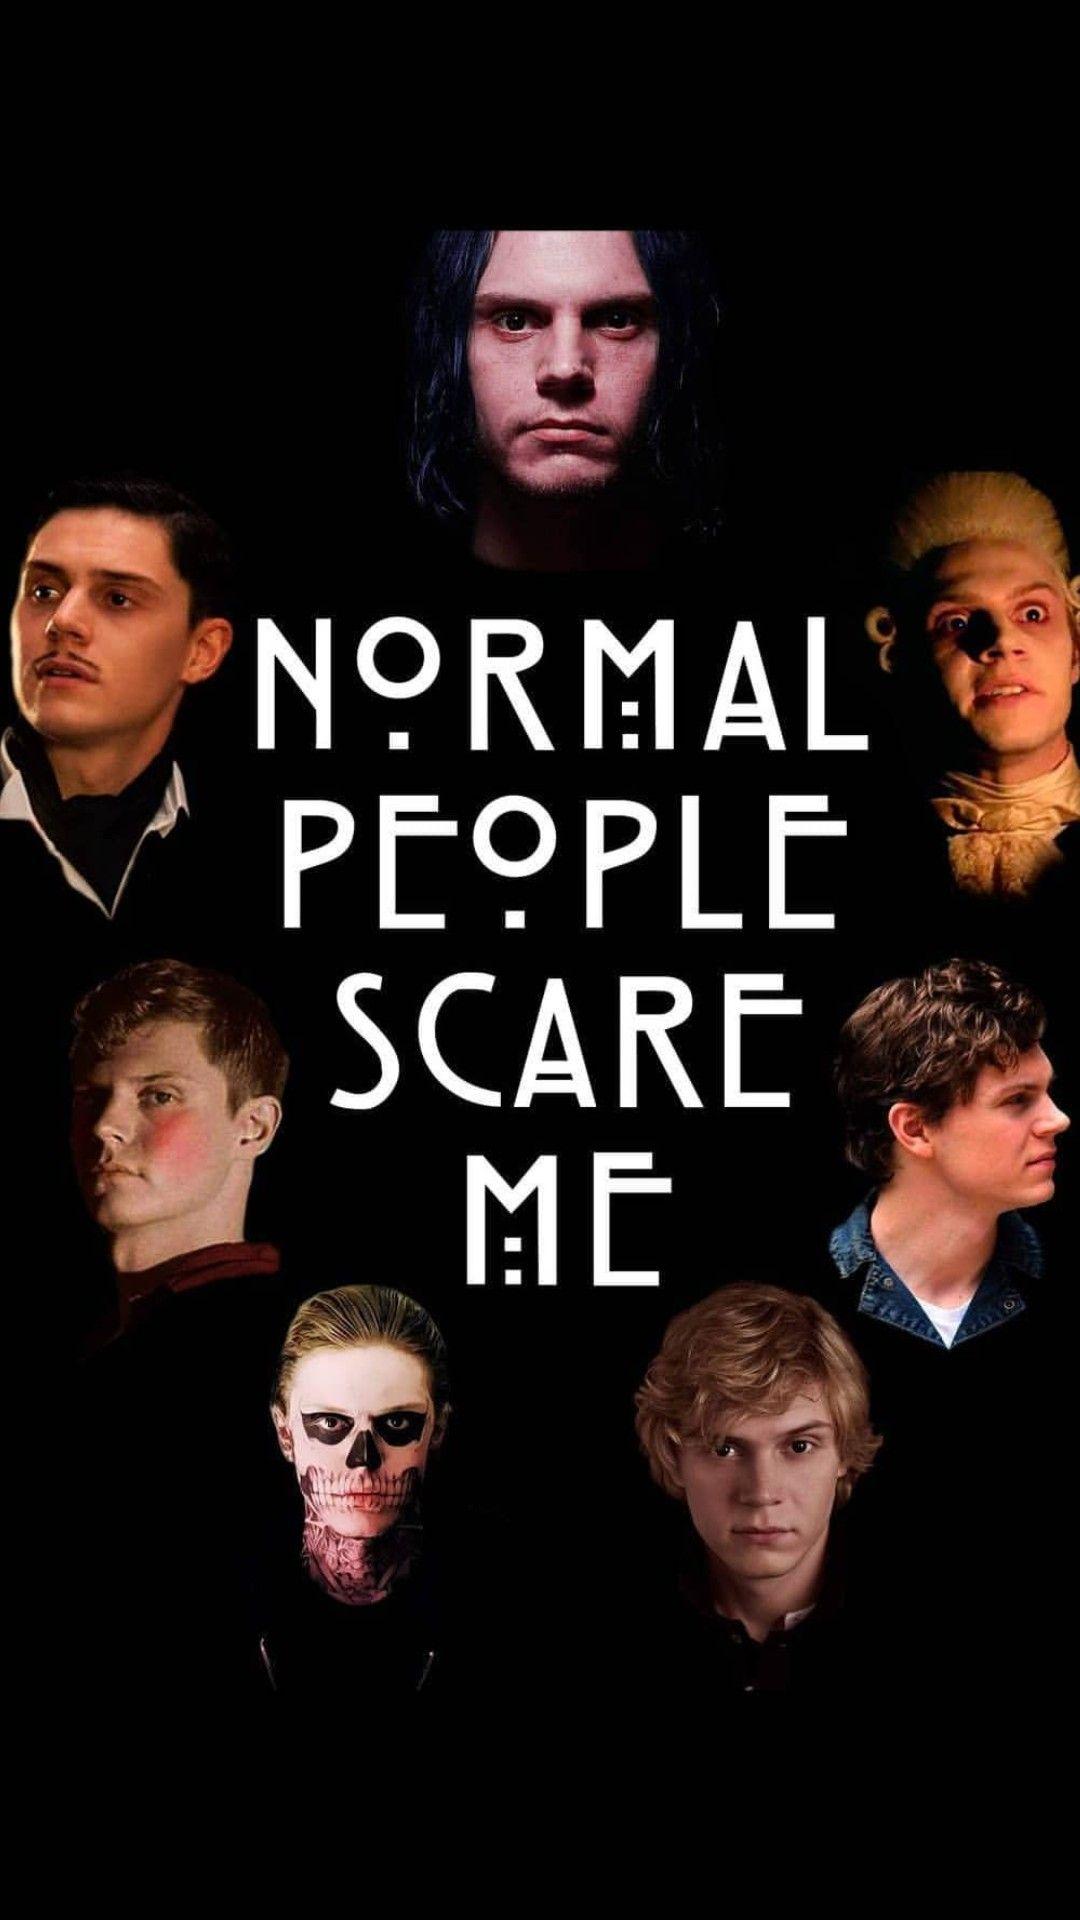 Normal People Scare Me Wallpaper American Horror Story Horror Show American Horror